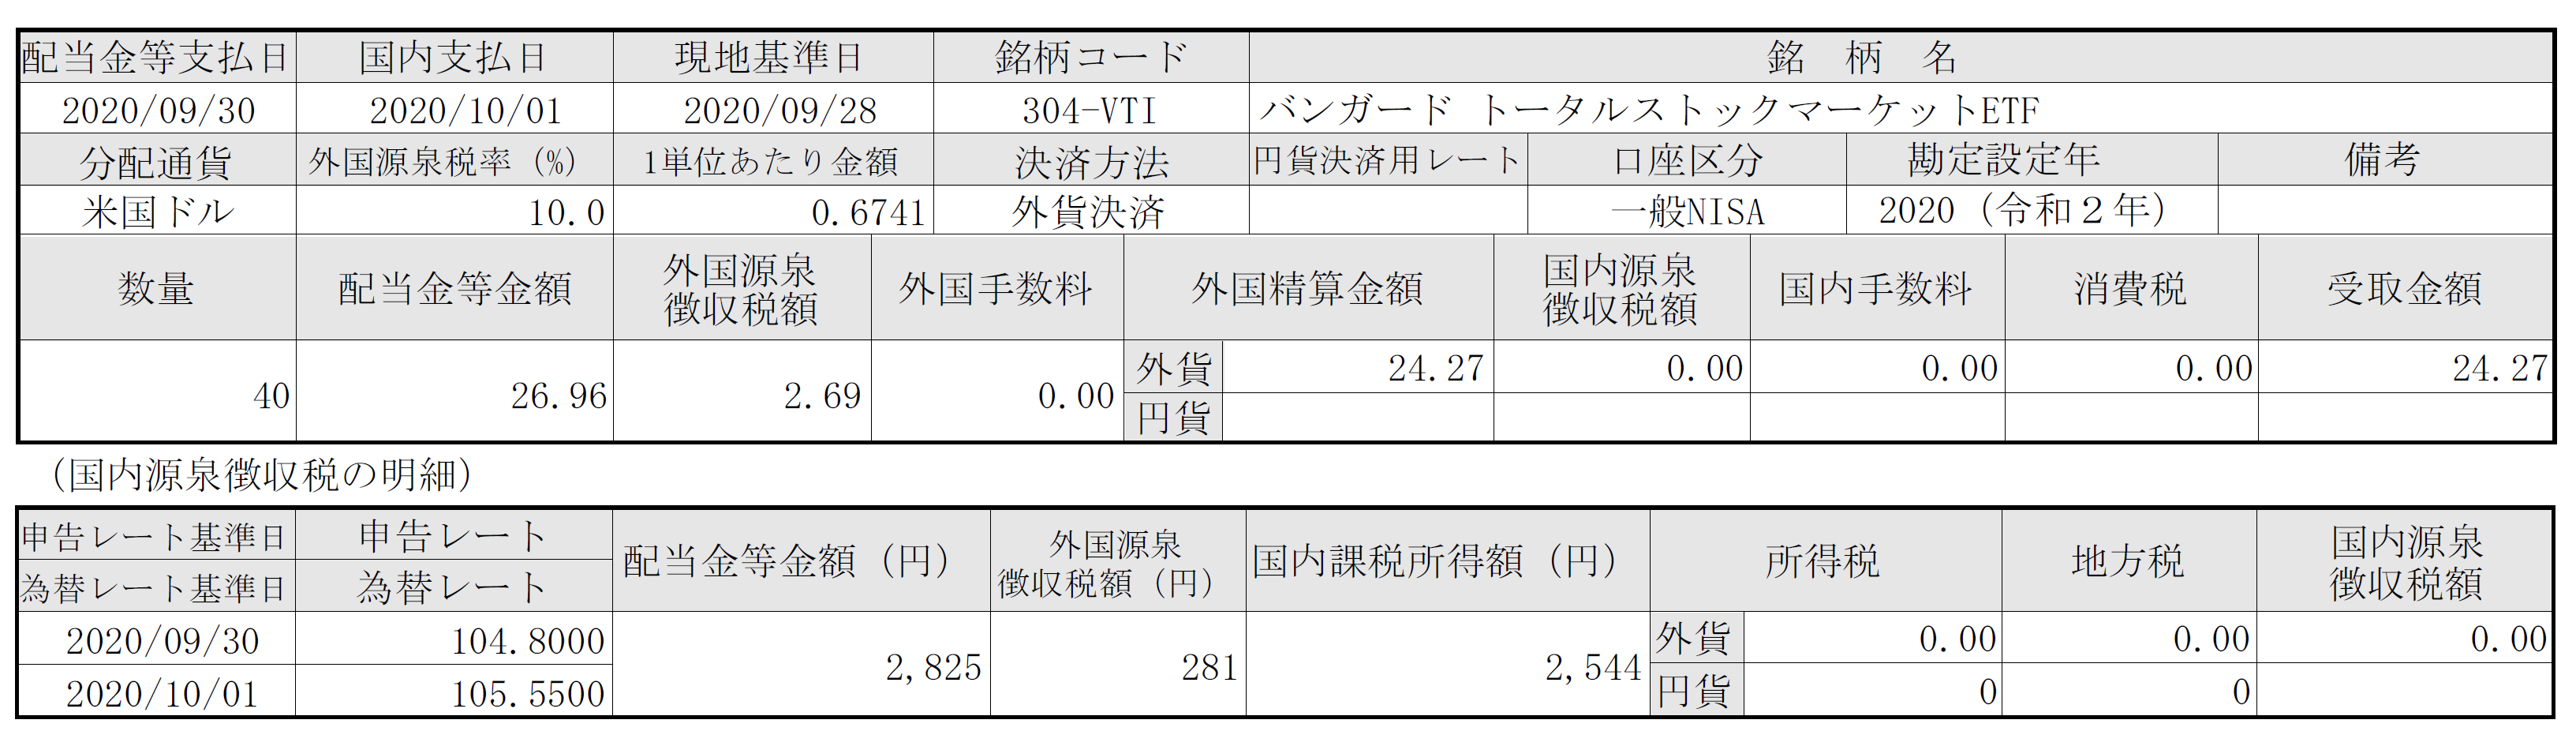 f:id:hodo-work:20201007163743p:plain